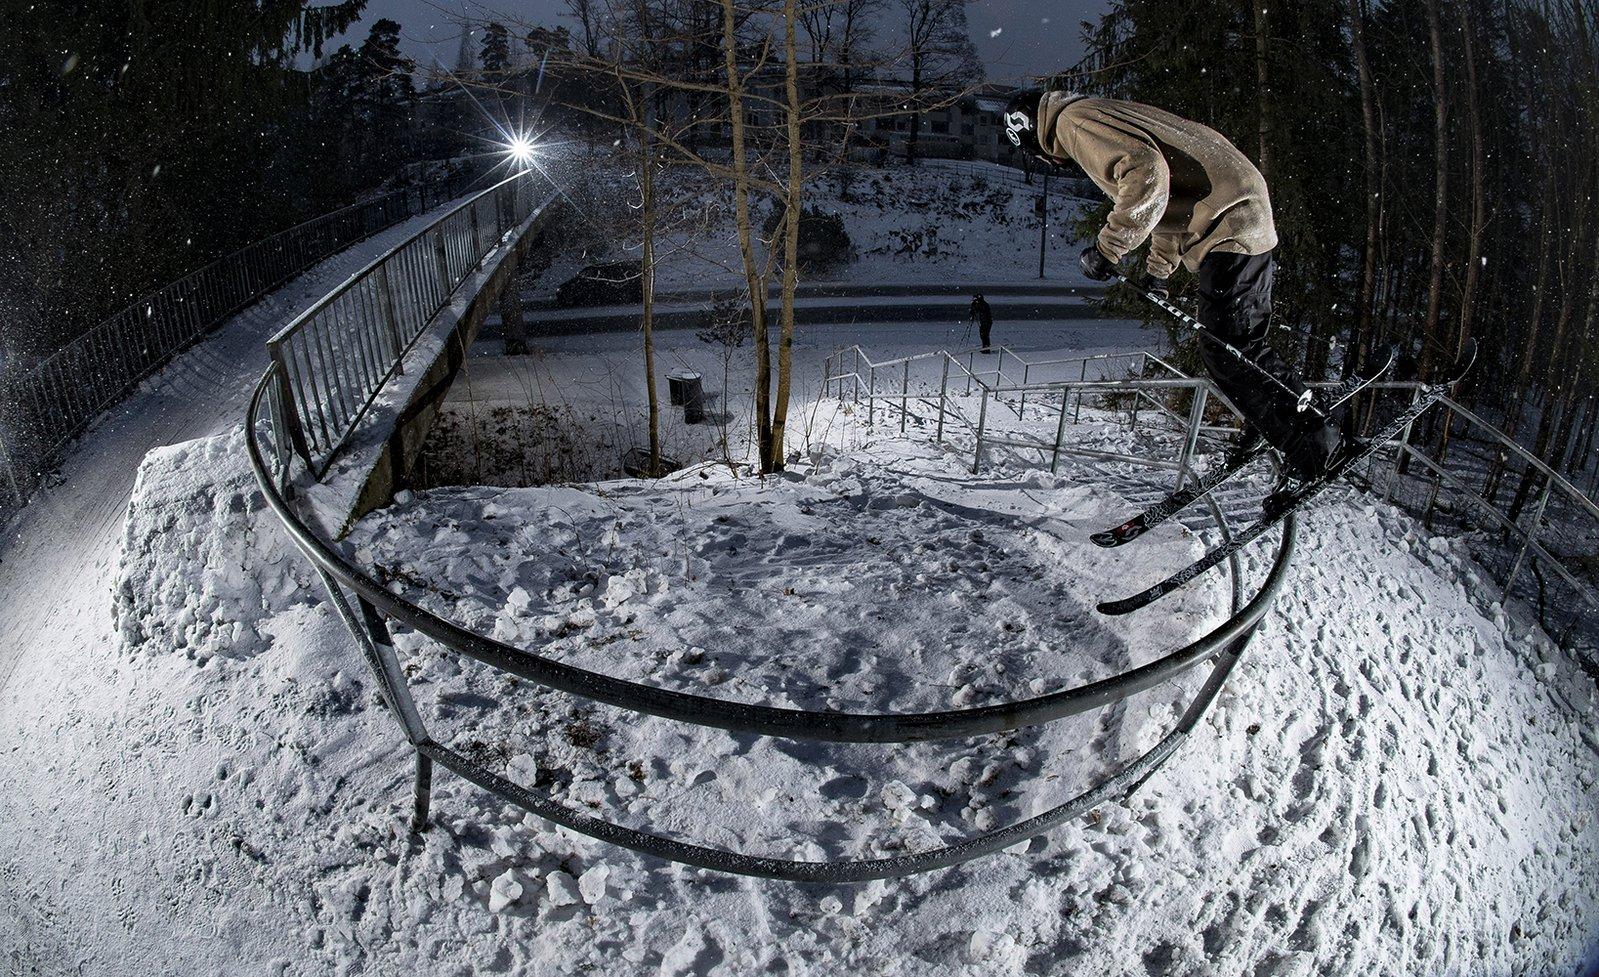 Will Wesson @ C-rail Quad kink, Espoo